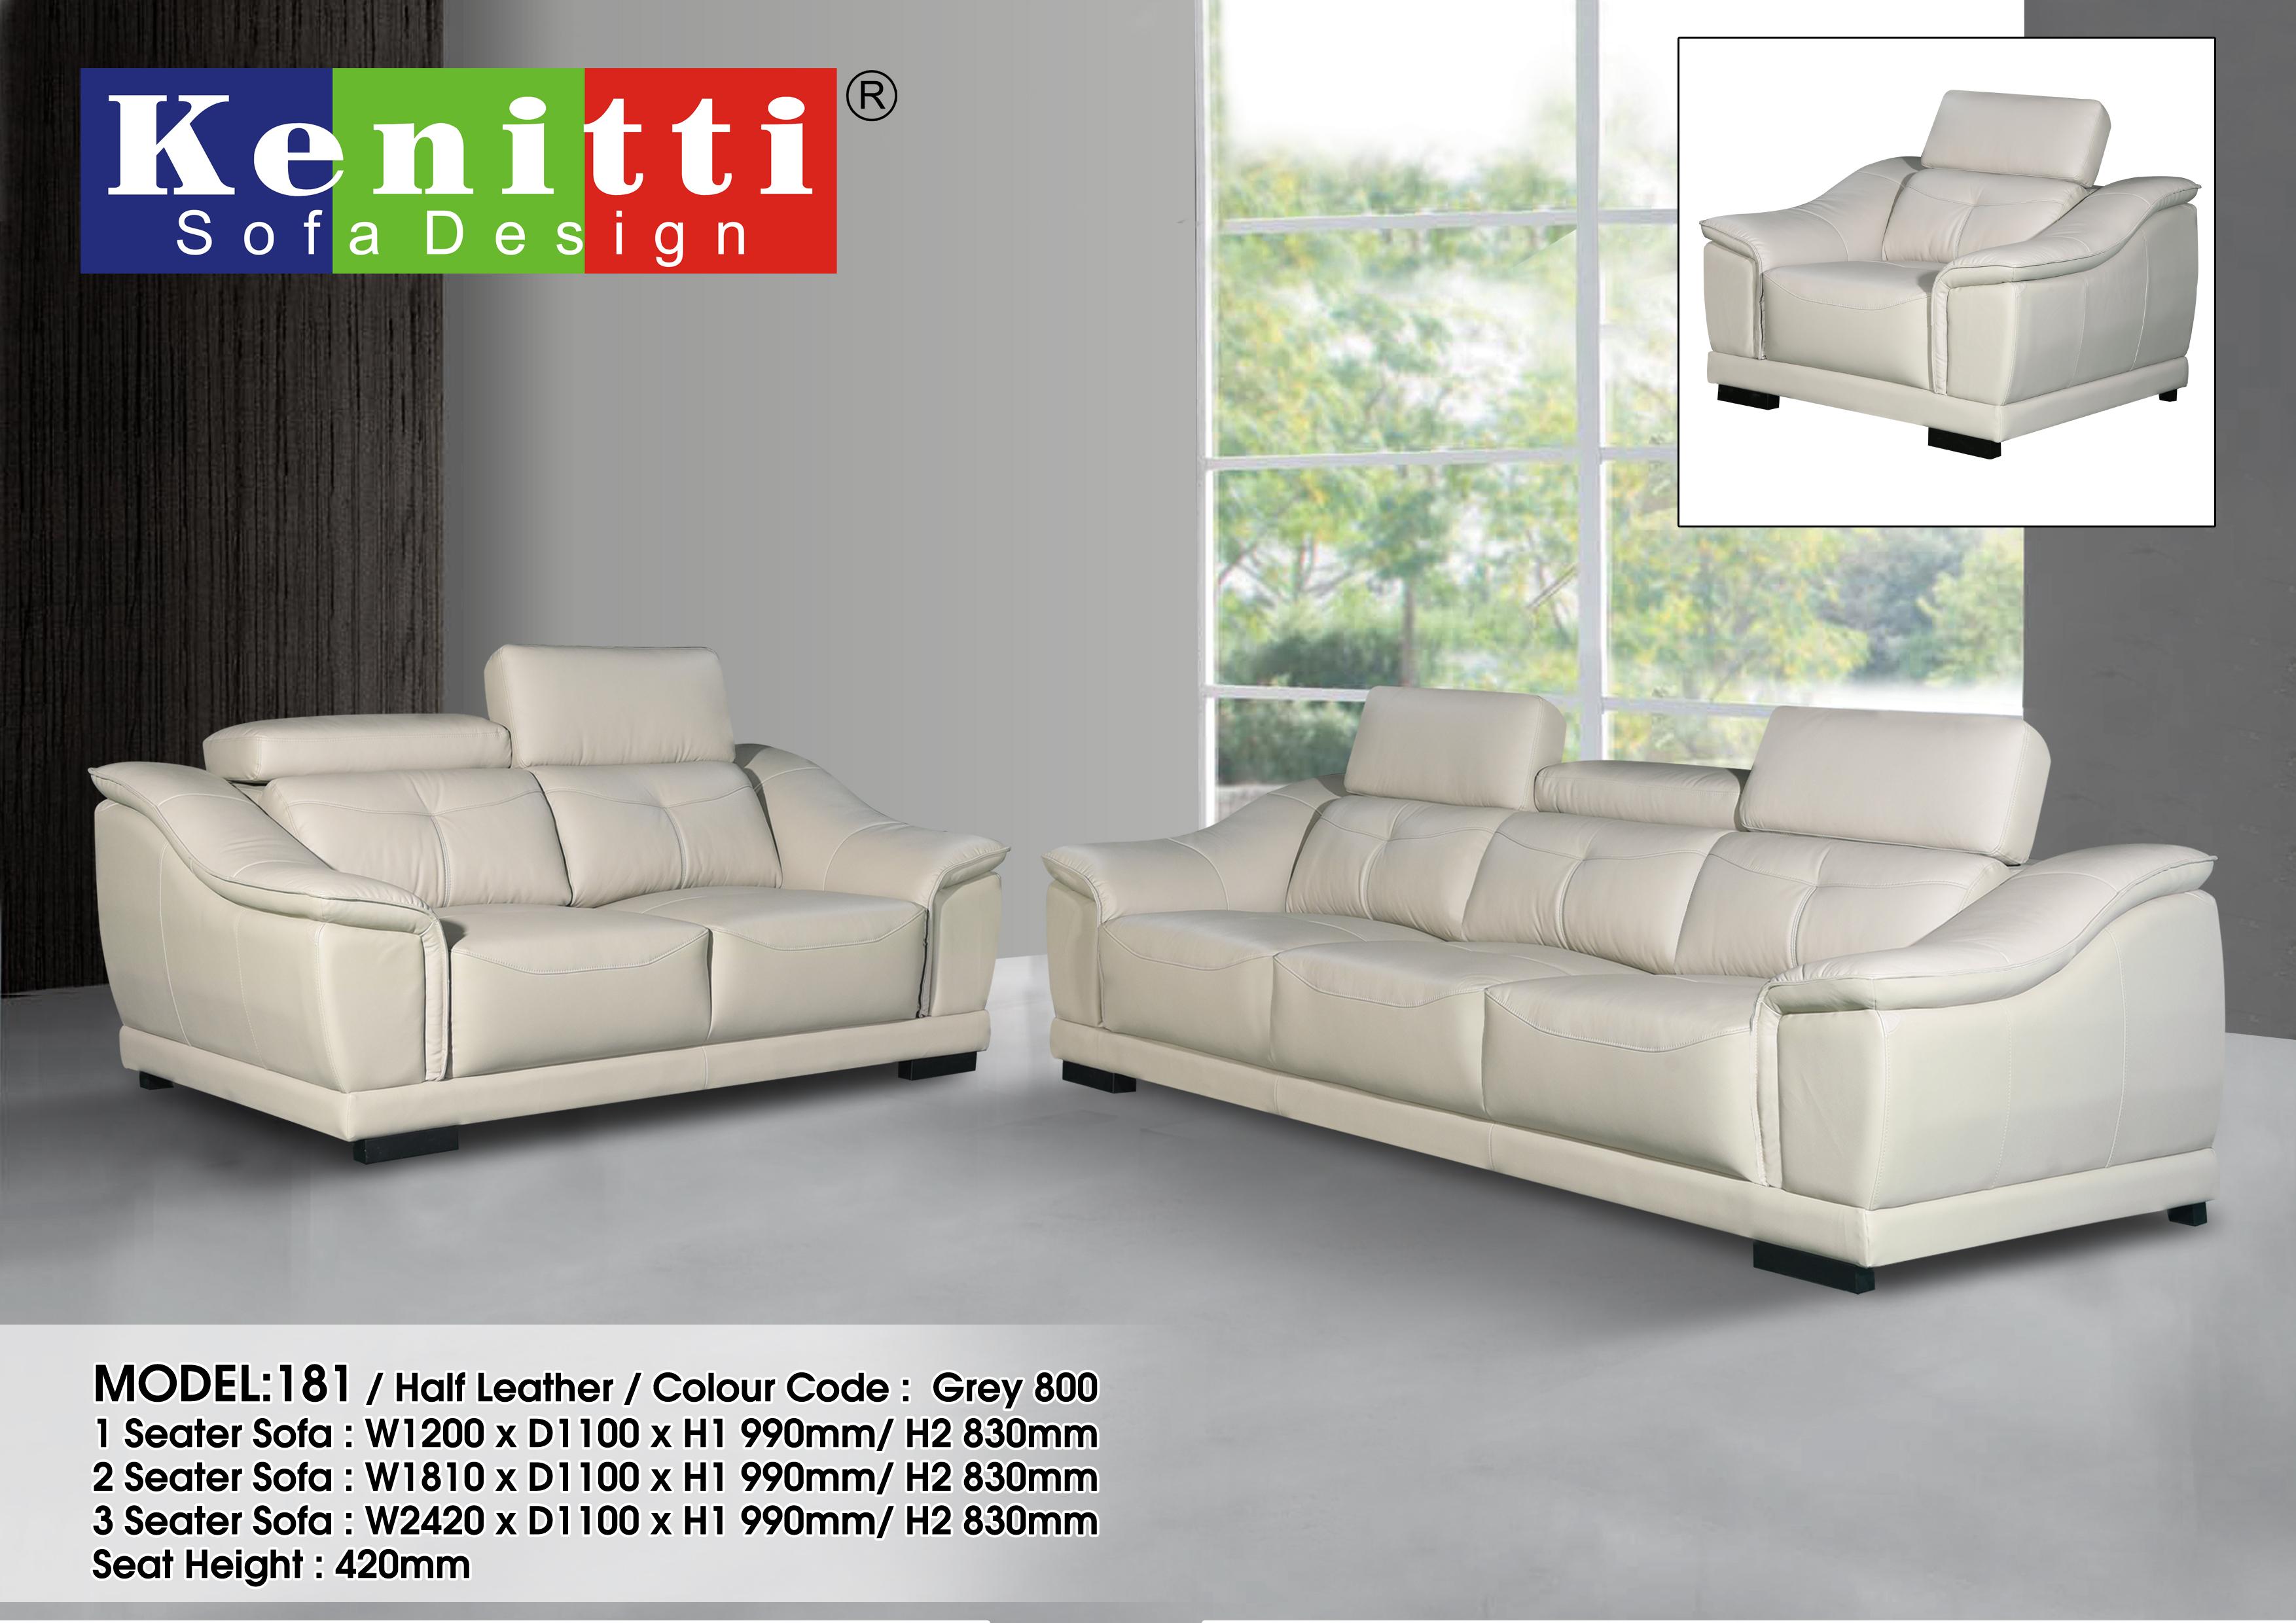 Model - 181 - 1 + 2 + 3 Half Leather